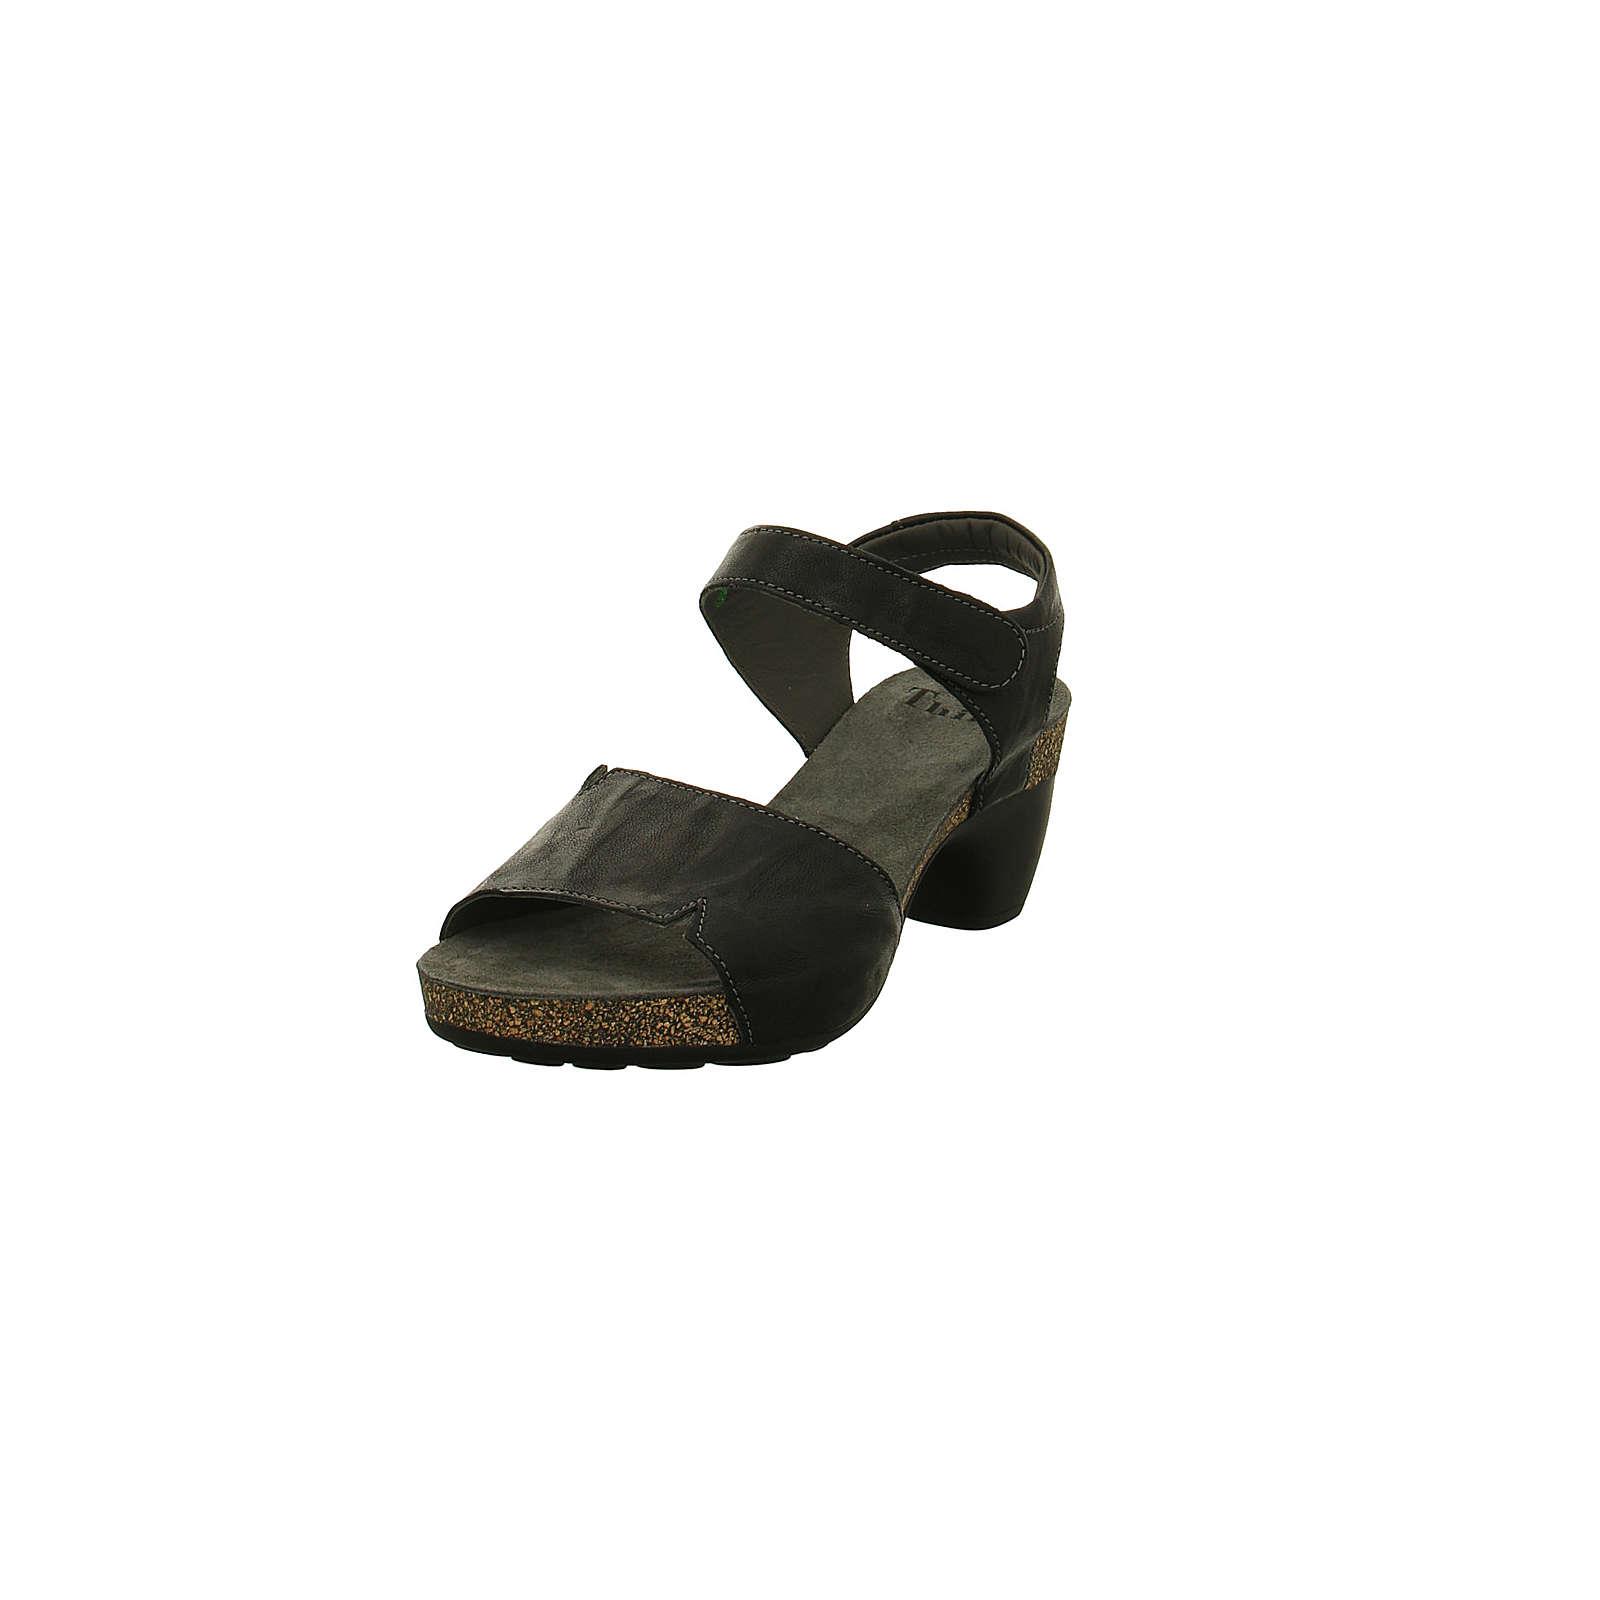 Think! Think Damen Sandalette – Traudi – Glattleder in schwarz – 89572-09 Klassische Sandaletten schwarz Damen Gr. 38